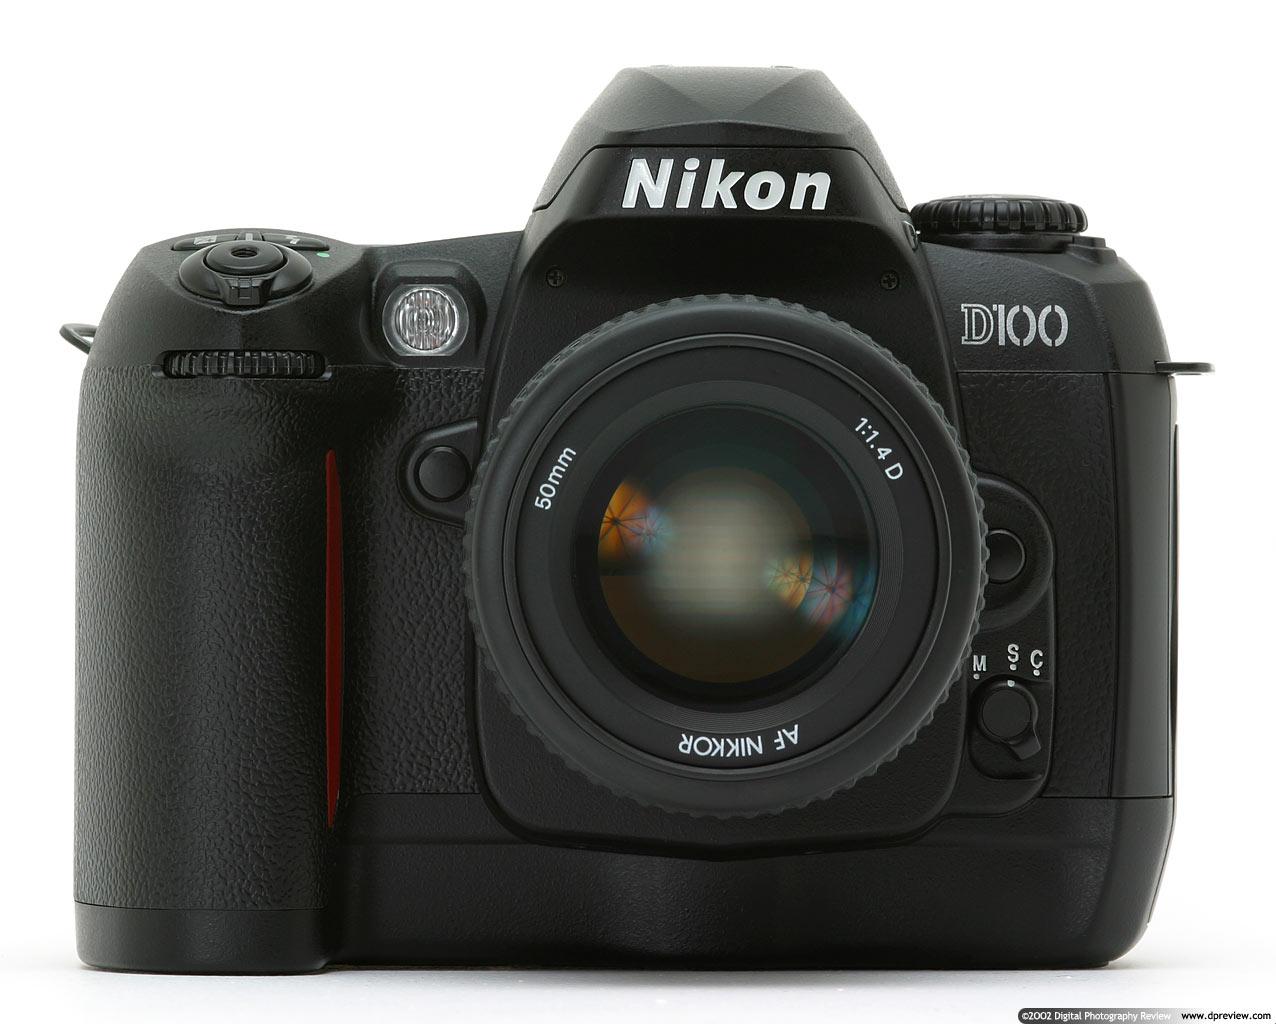 Nikon D100 Review: Digital Photography Review